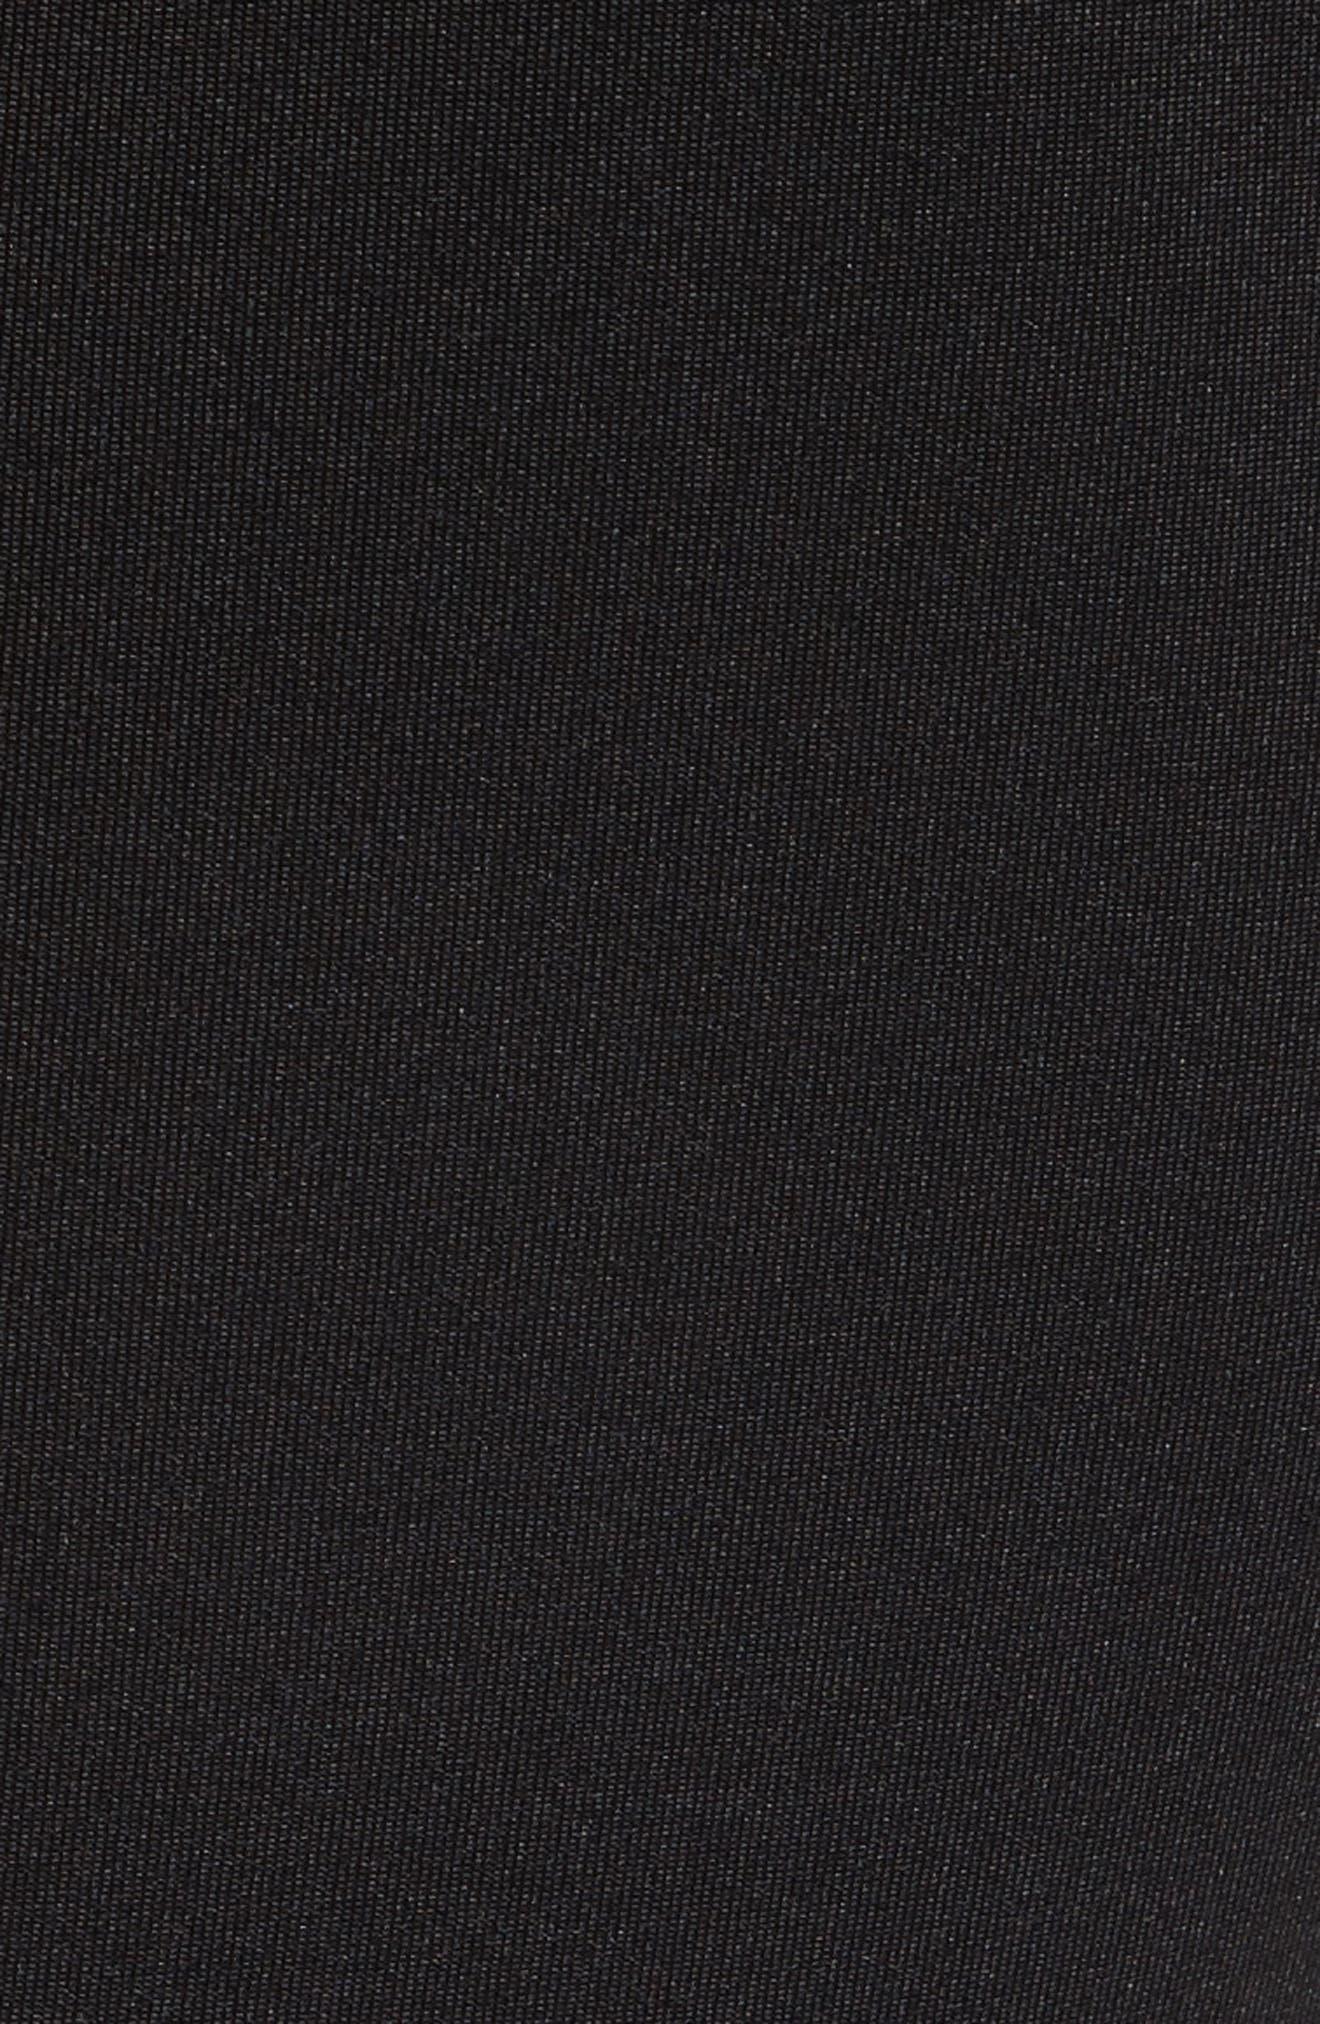 Mesh Panel Scallop Skater Dress,                             Alternate thumbnail 5, color,                             Black